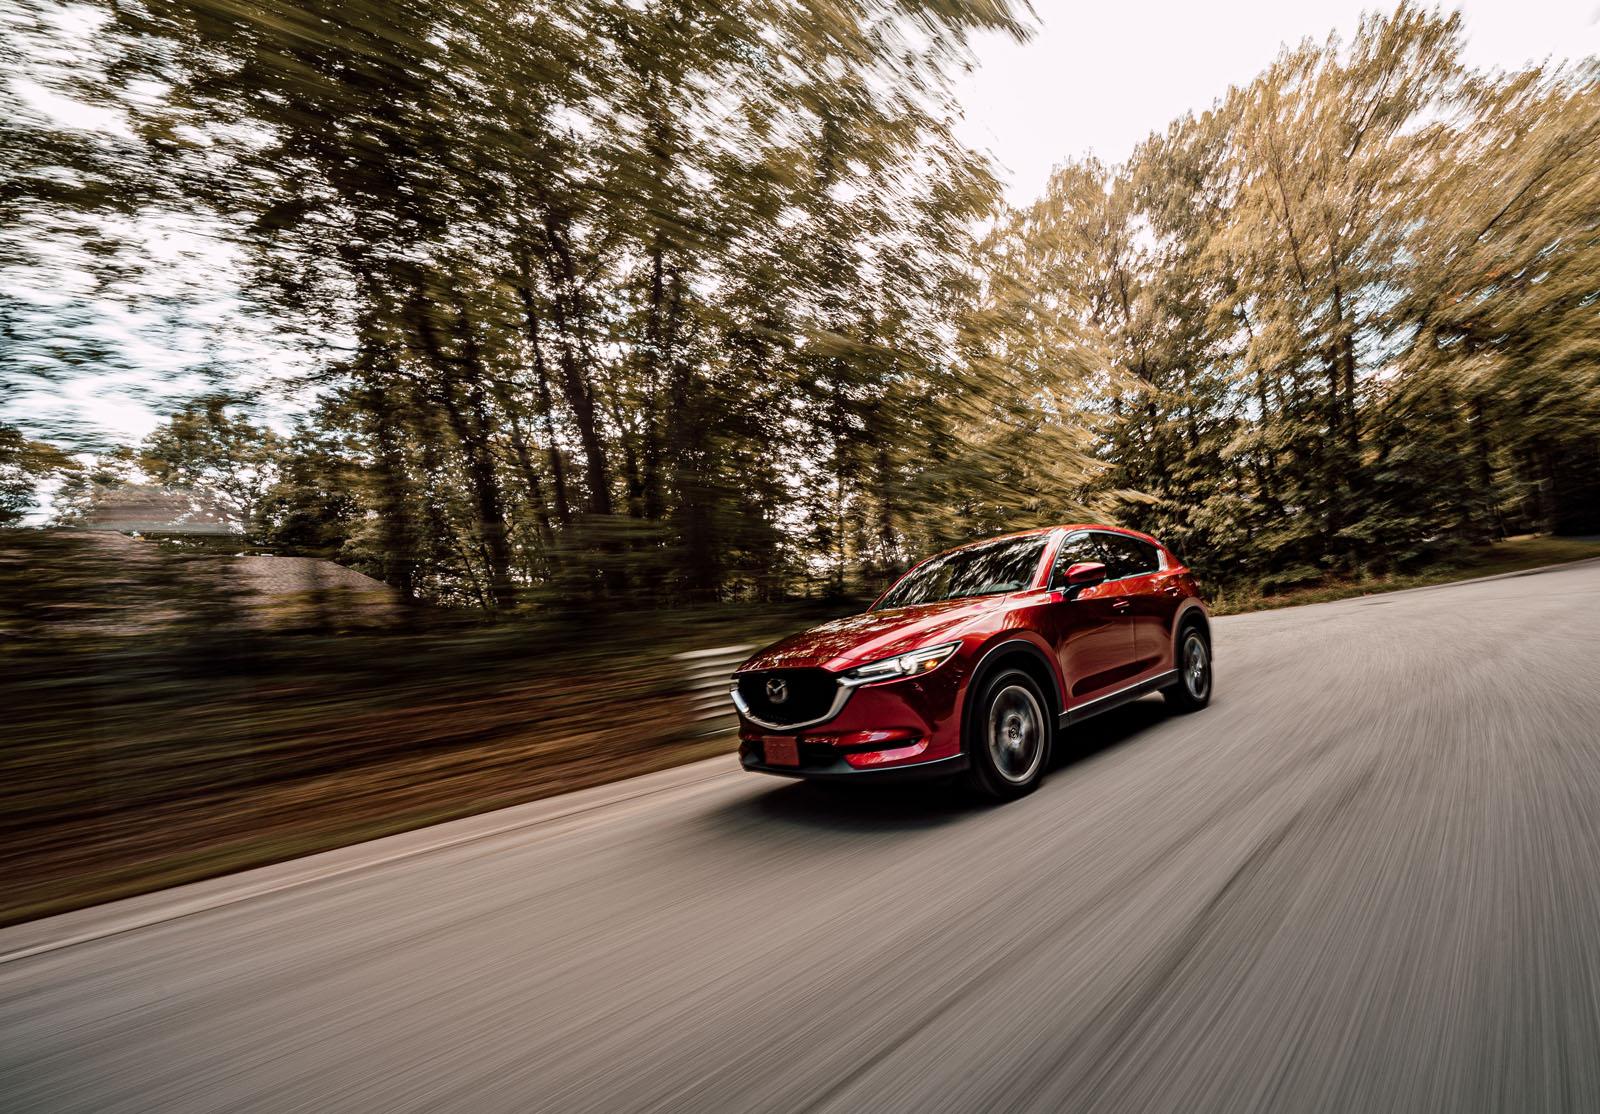 Should You Buy a 2020 Mazda CX-5?